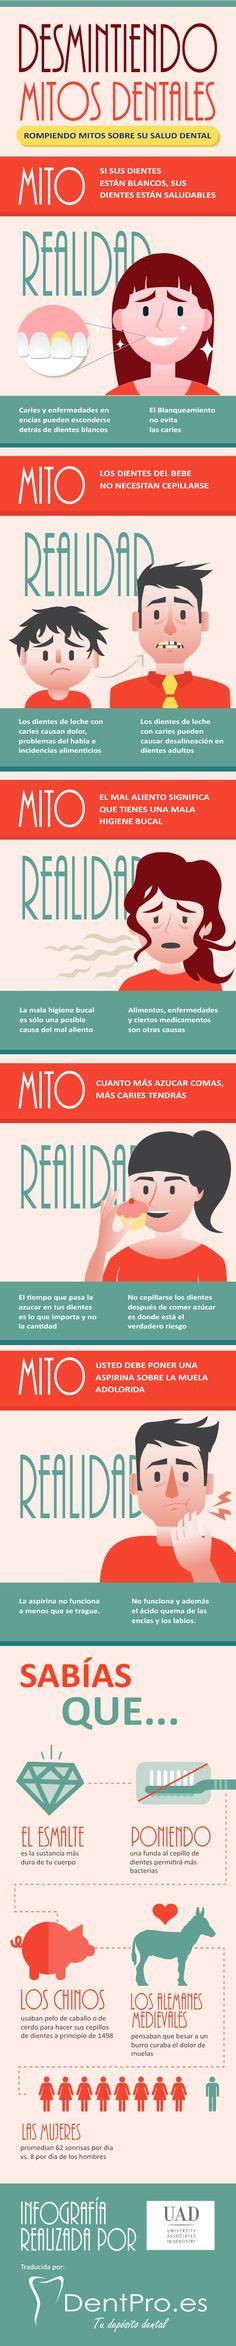 #MitosDentales #dentalinfo #dental #odontologia #dentales